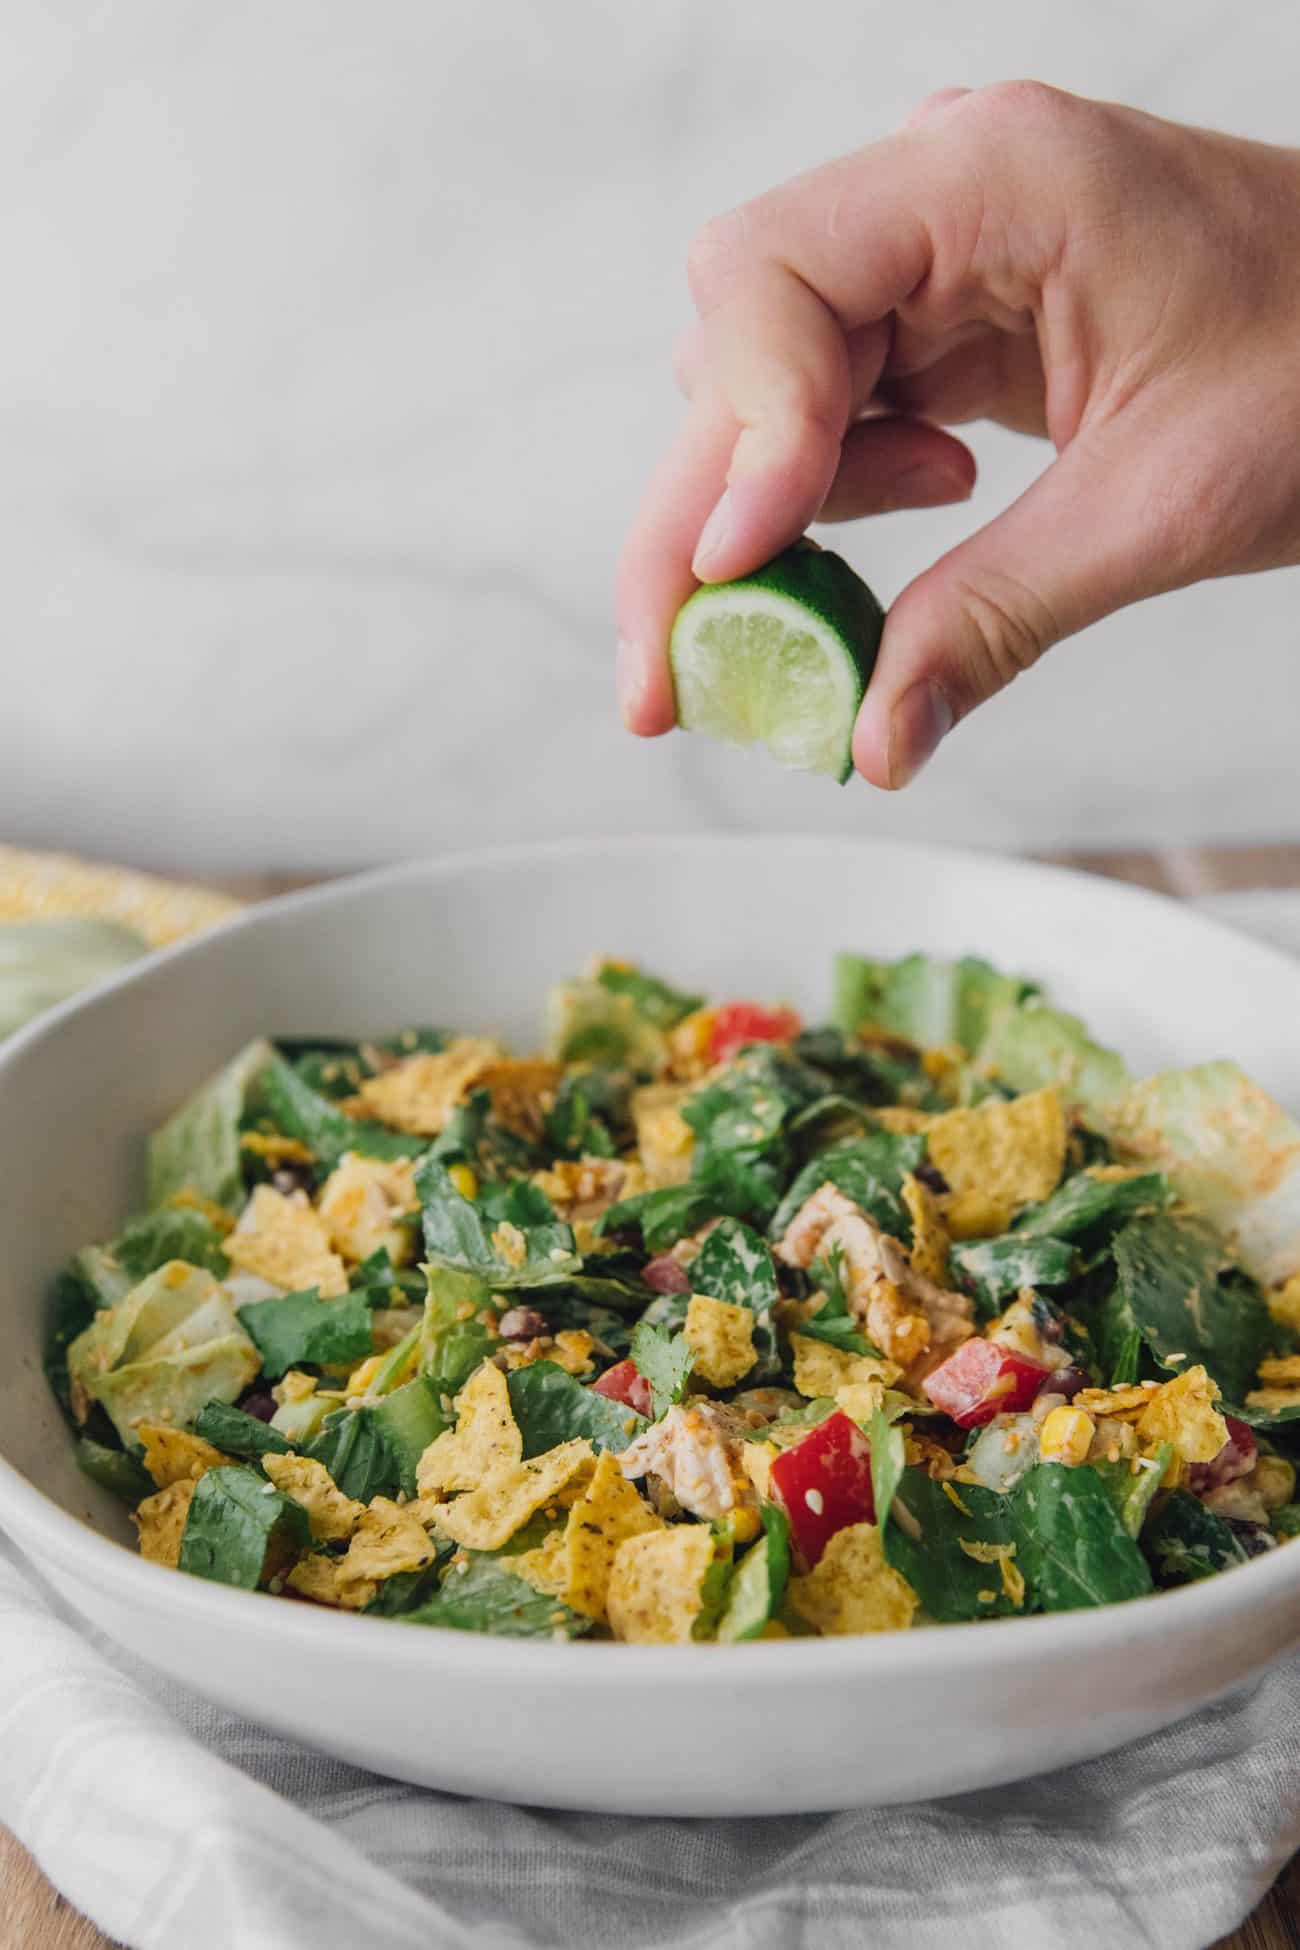 Tex-Mex Chopped Chicken Salad